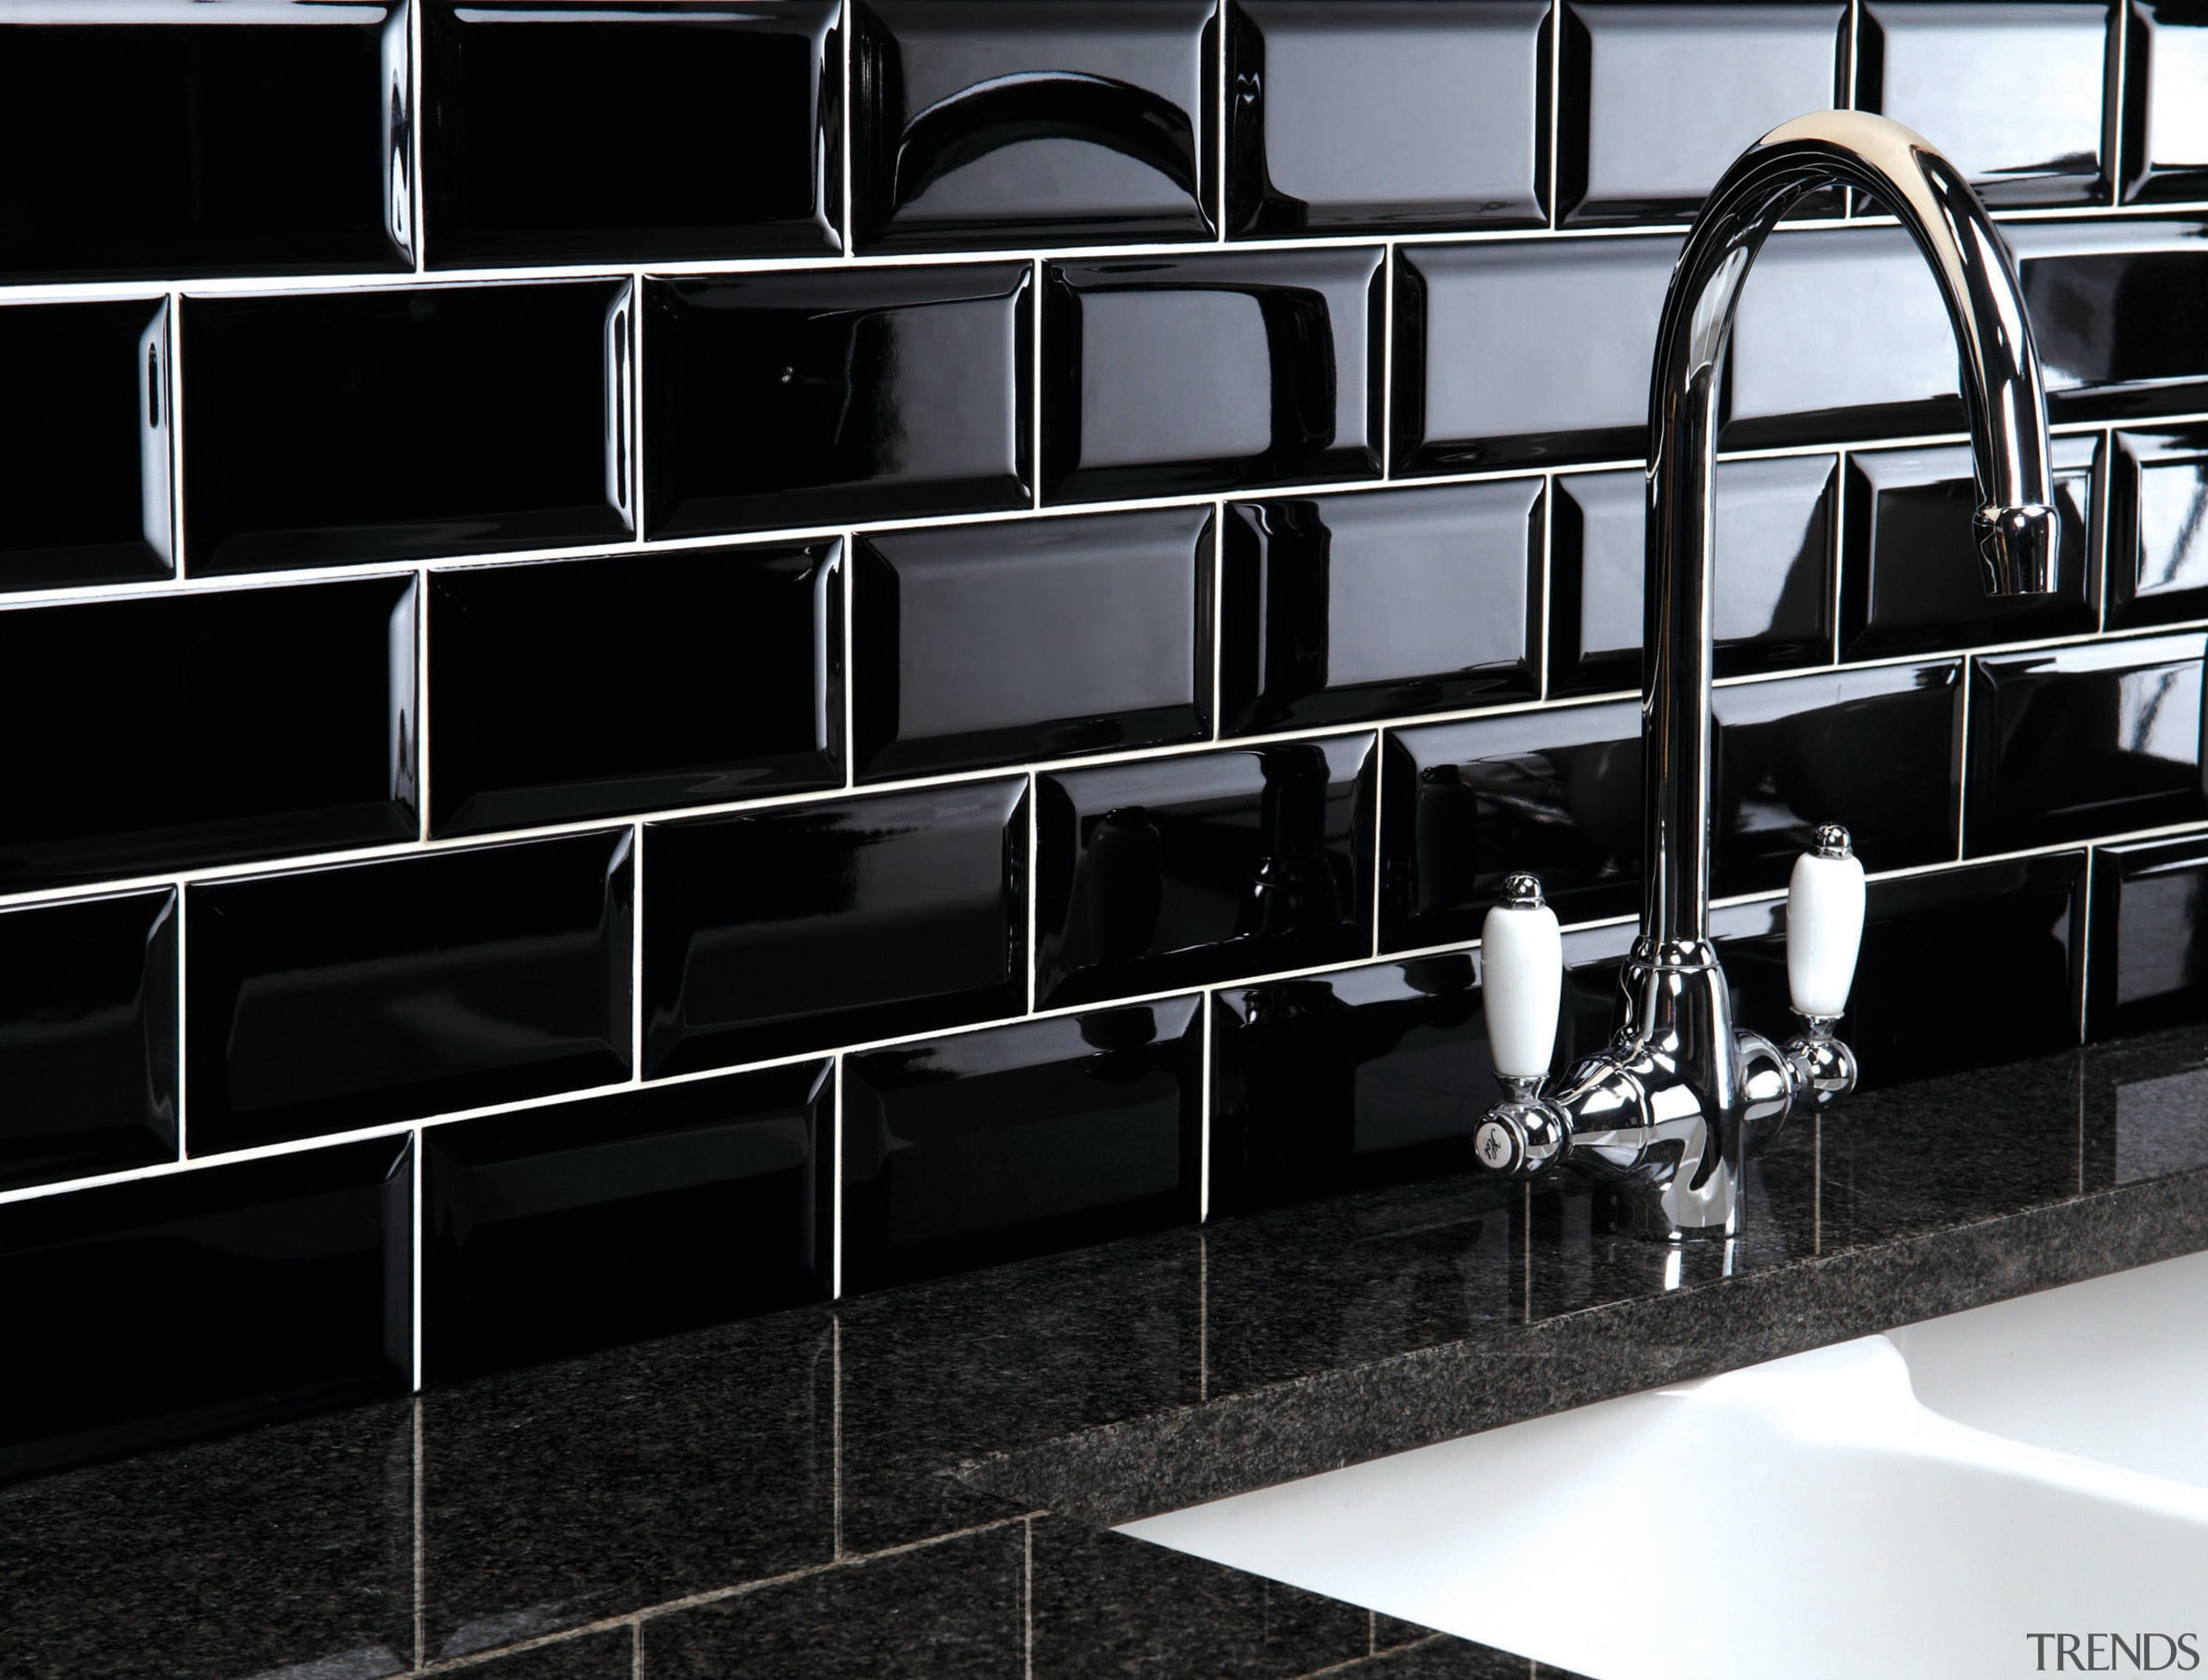 These sleek black tiles from Tile Trends create black, black and white, design, floor, flooring, furniture, glass, interior design, product design, tile, wall, black